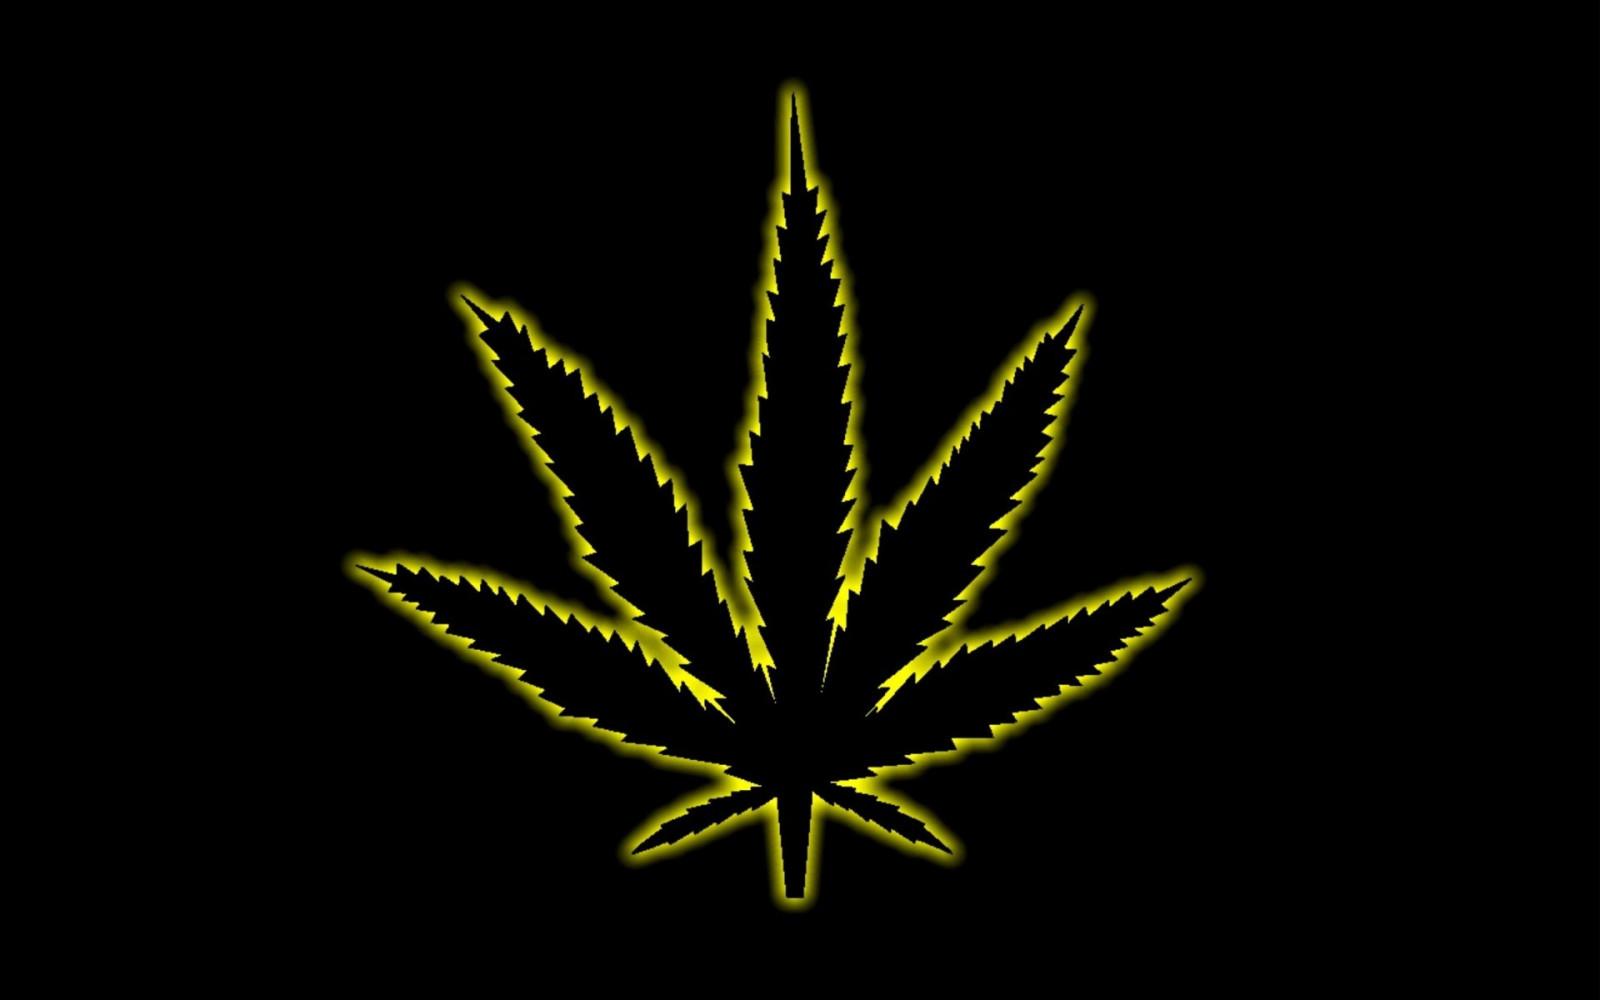 Wallpaper : minimalism, yellow, cannabis, leaf, flower ...